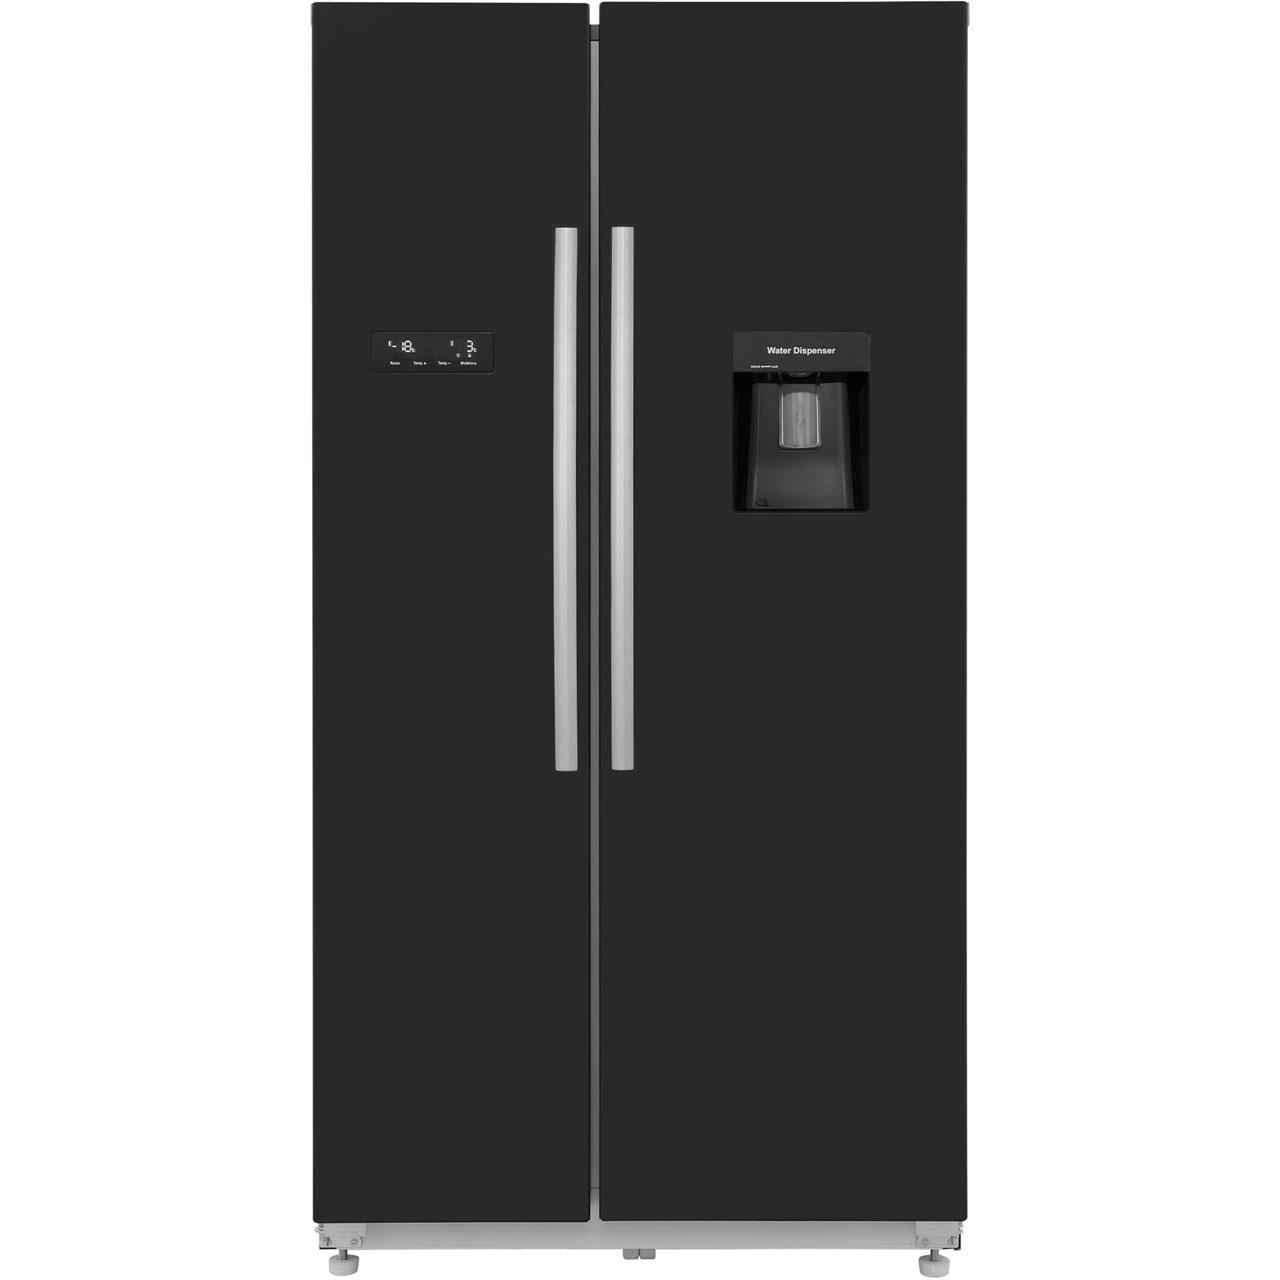 Hisense RS723N4WB1 Free Standing American Fridge Freezer in Black Gloss